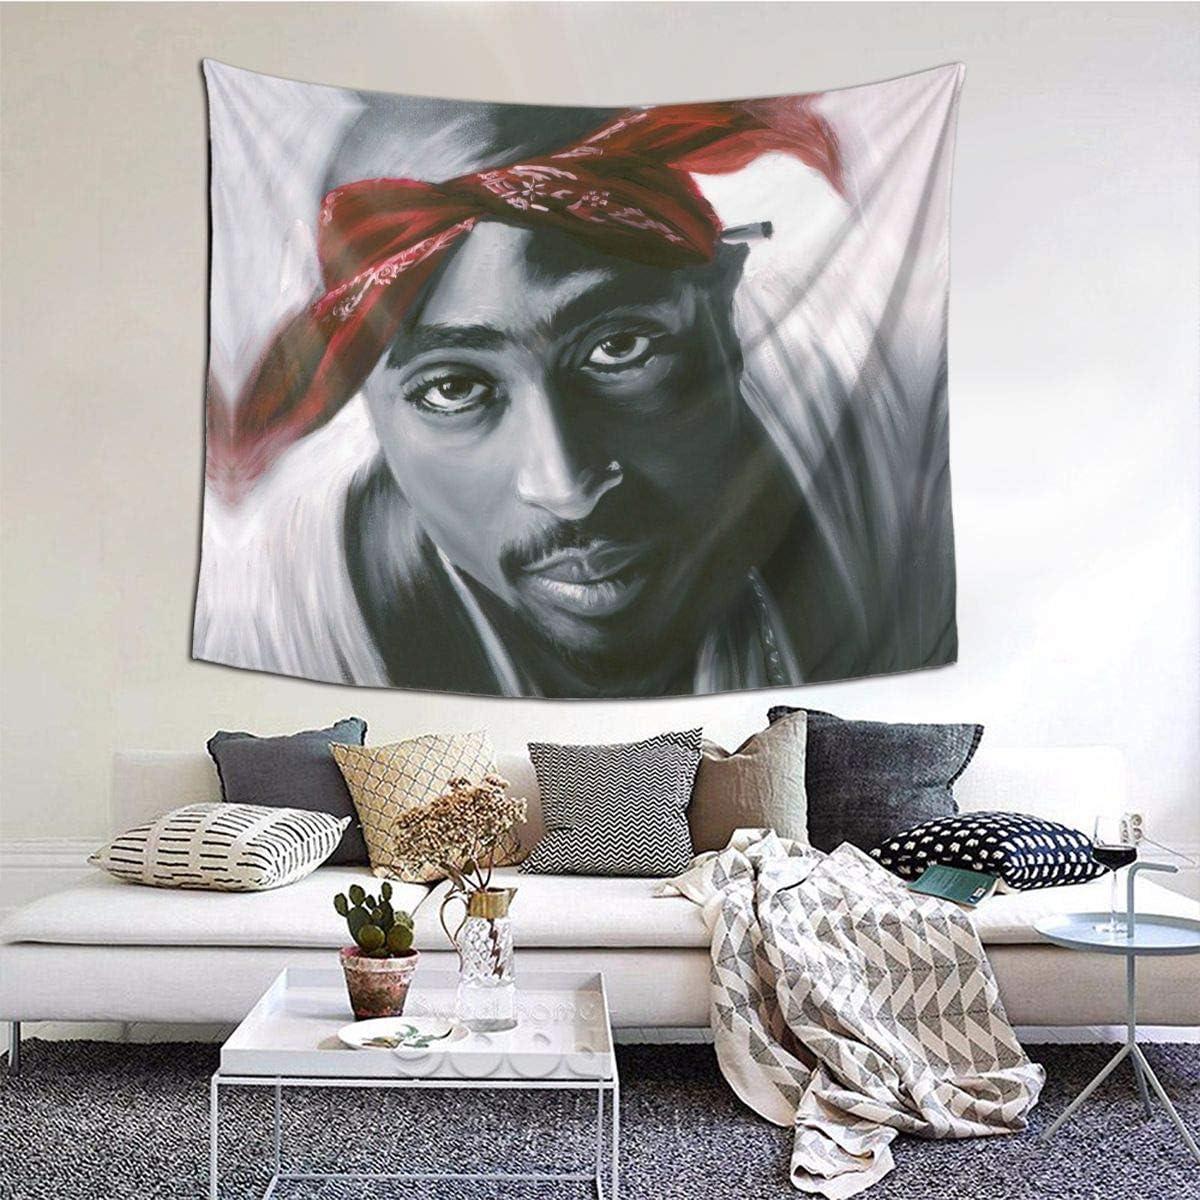 Heart Yan Tu-Pac Sha-Kur Tapestry, 3D Print Wall Art Blanket, Wall Hanging Bedding Decor for Bedroom Living Room Dorm Home College Dorm Room 60 X 51 Inch